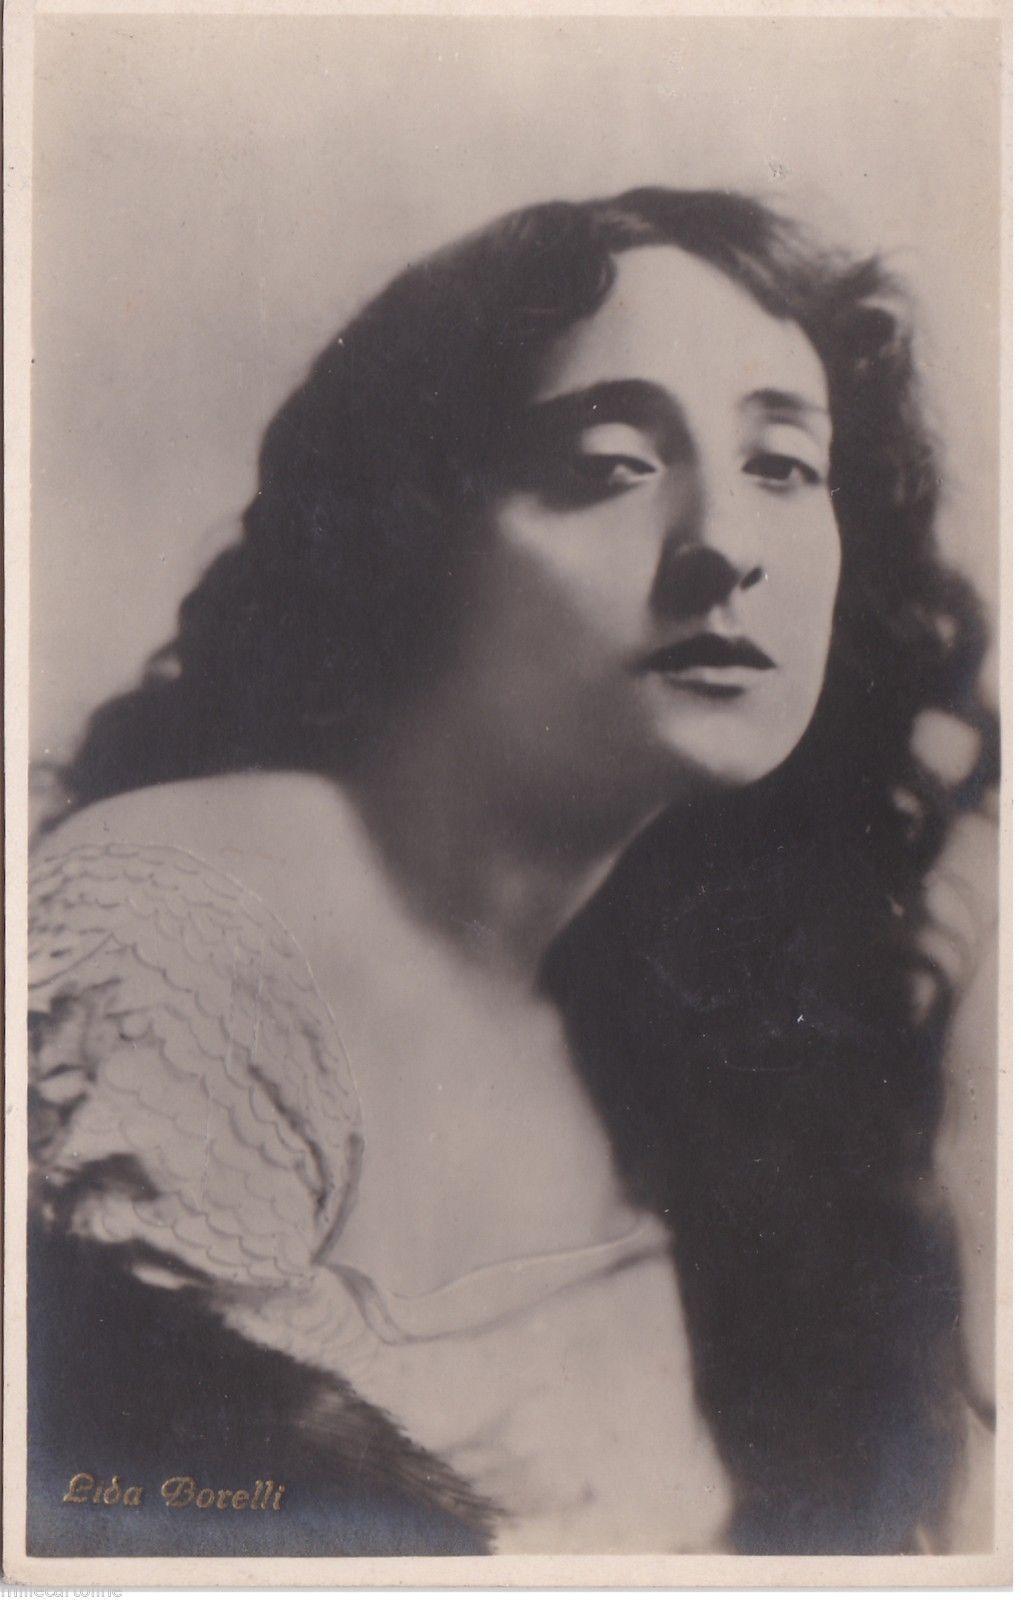 Lyda Borelli (1884?959) Lyda Borelli (1884?959) new pictures